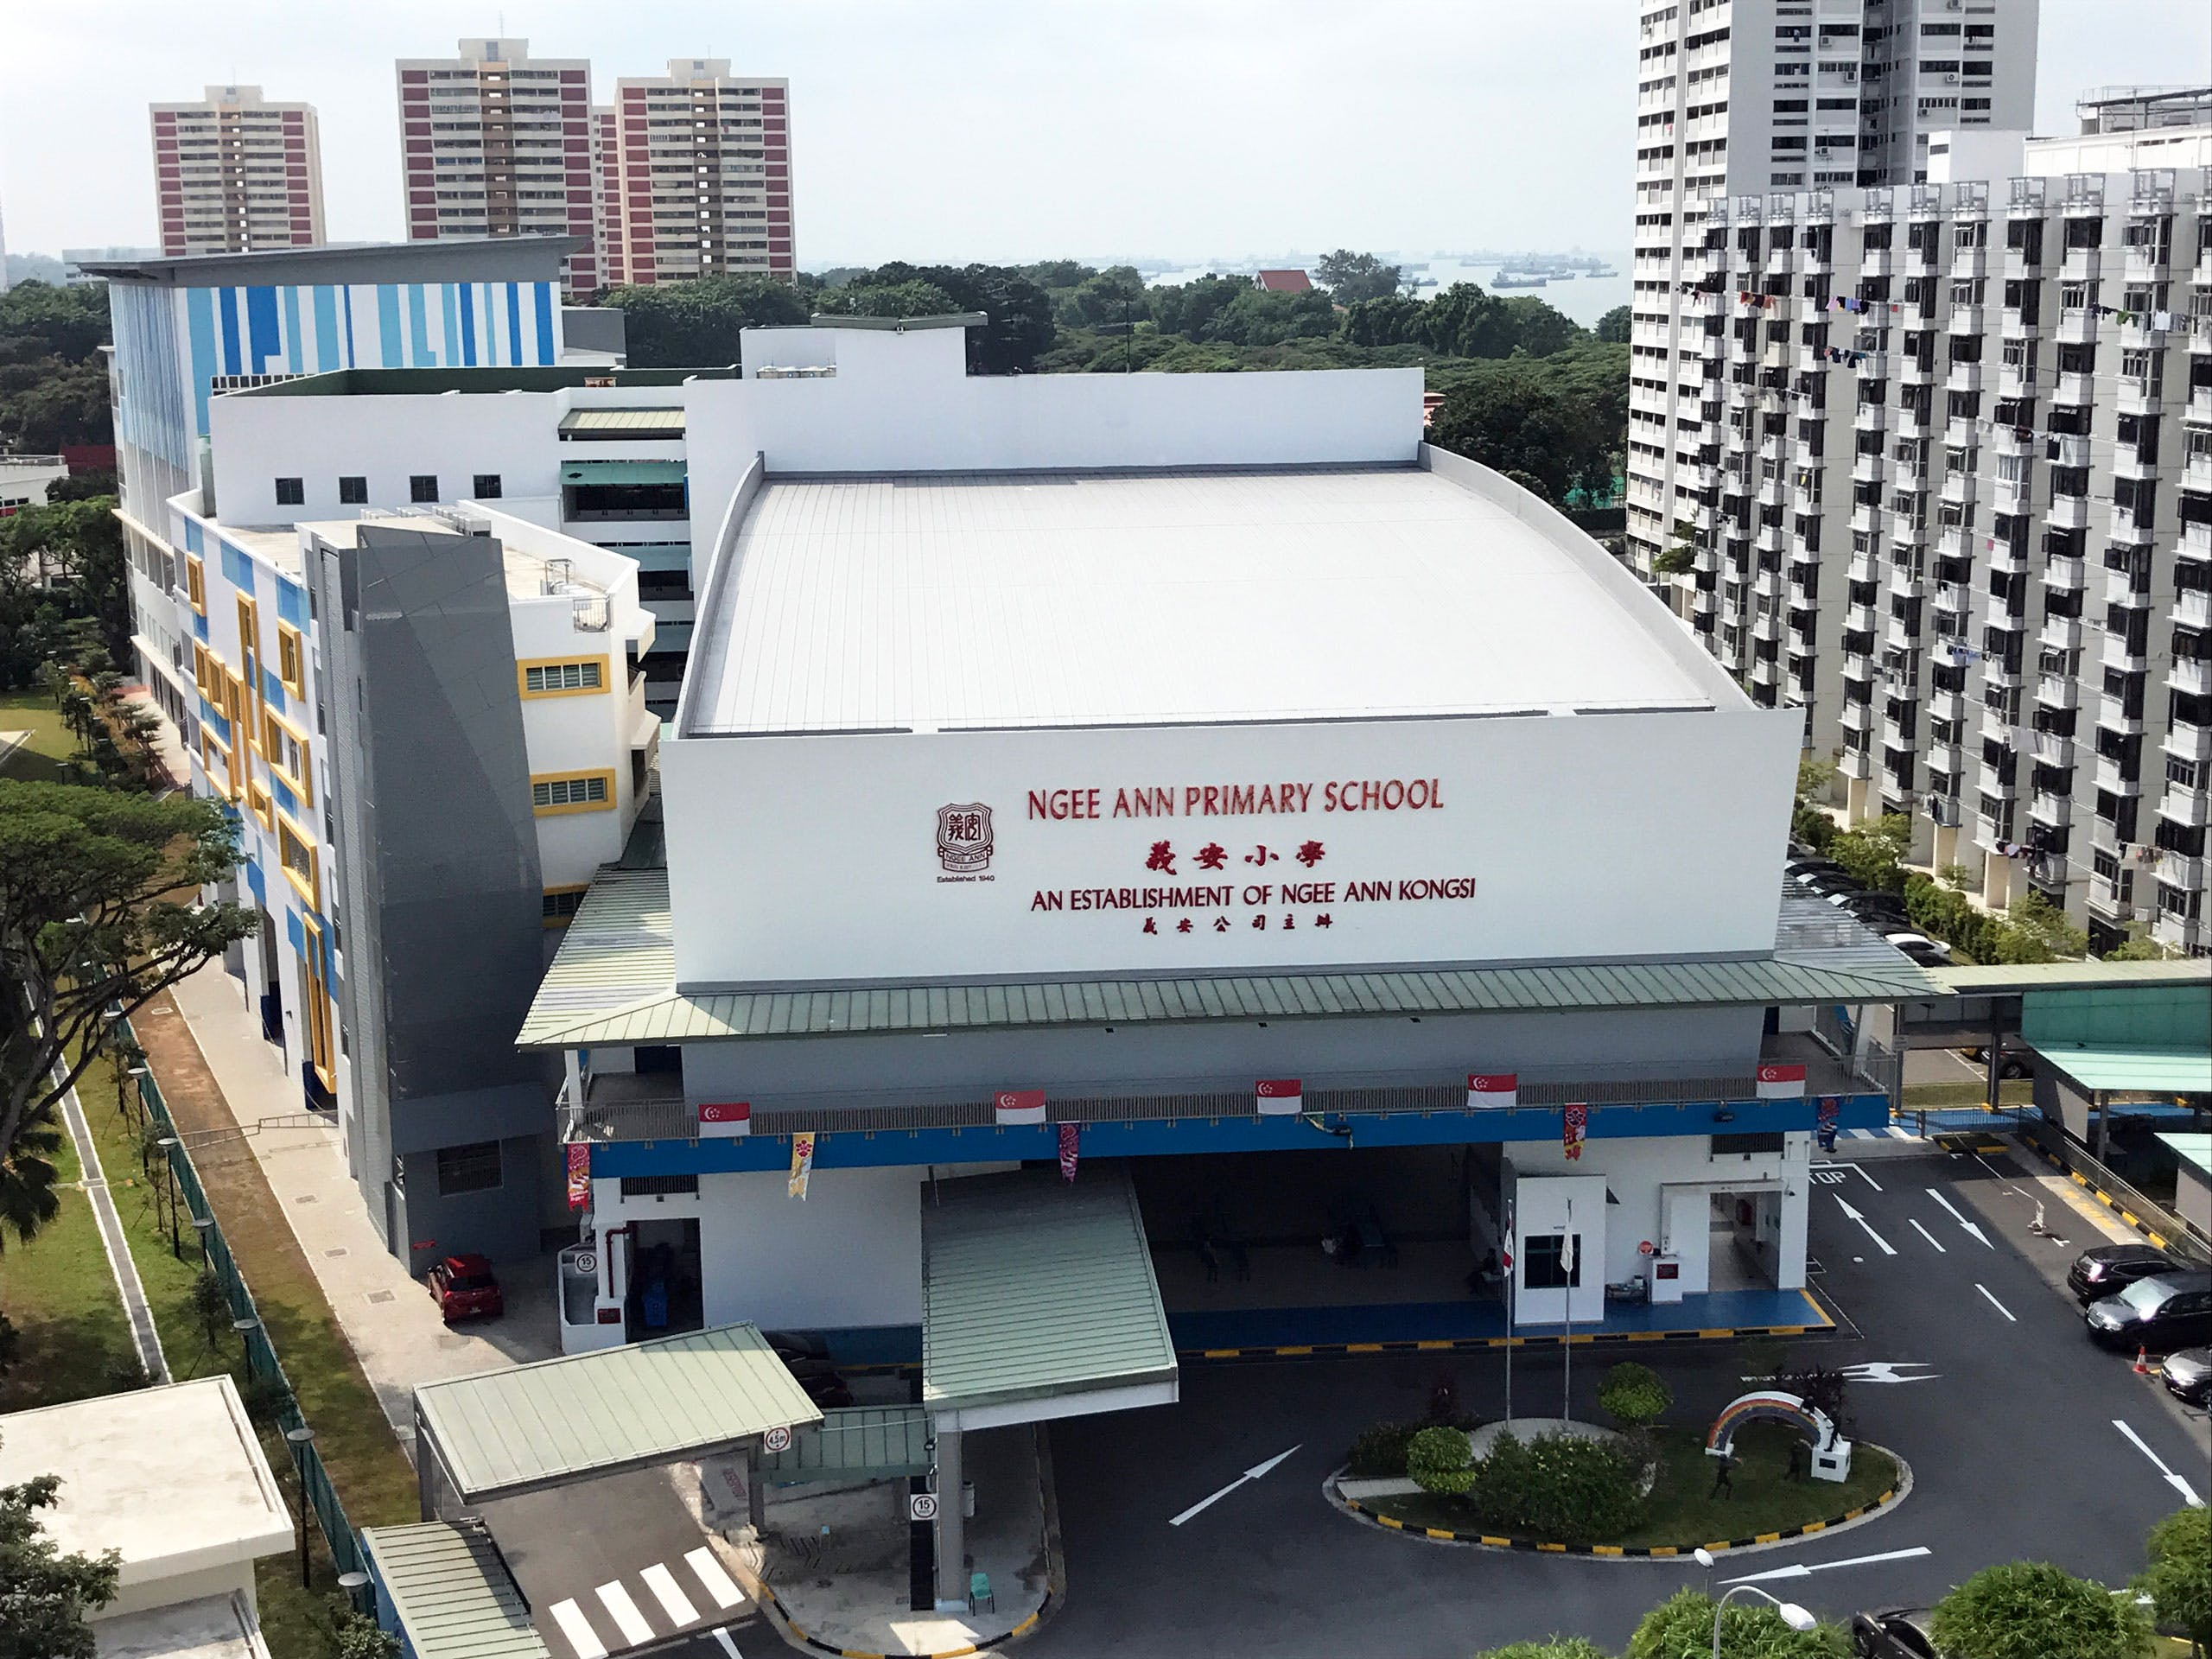 Ngee Ann Primary School